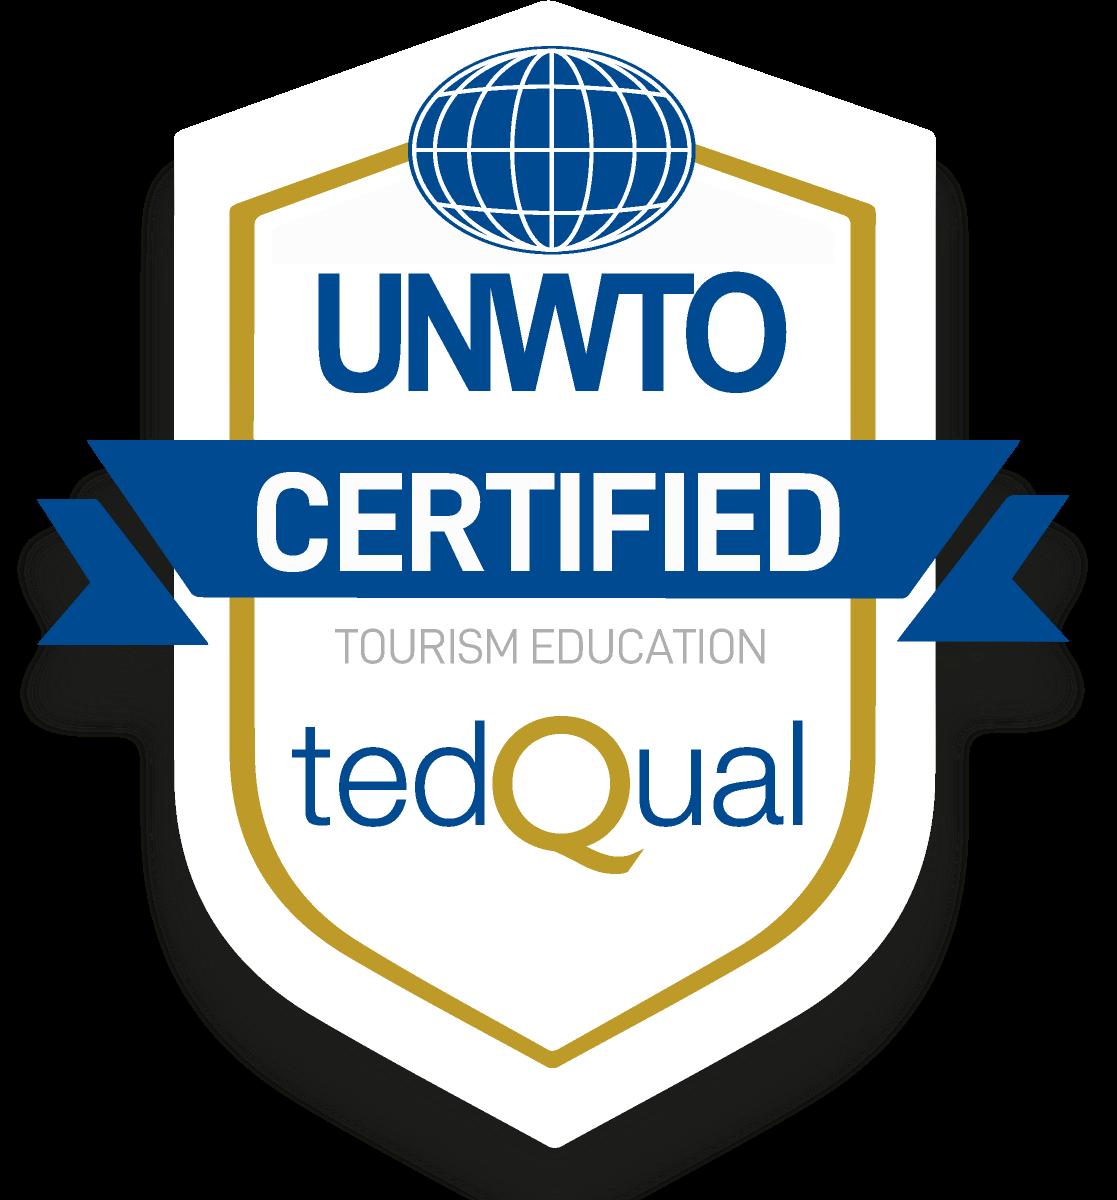 UNWTO TedQual